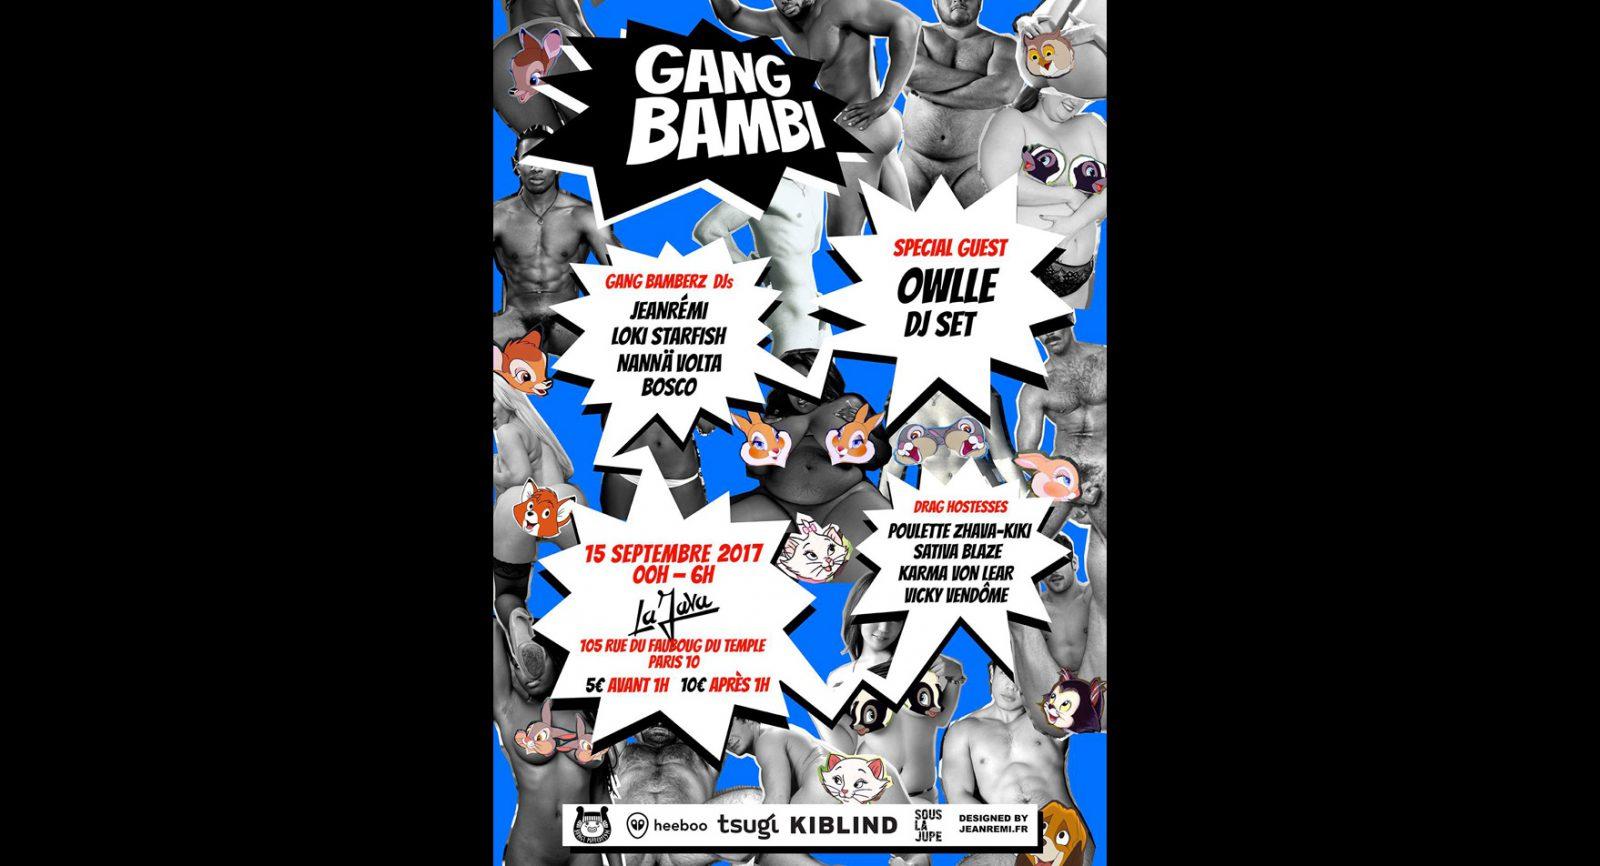 Gang Bambi XXL w/Owlle